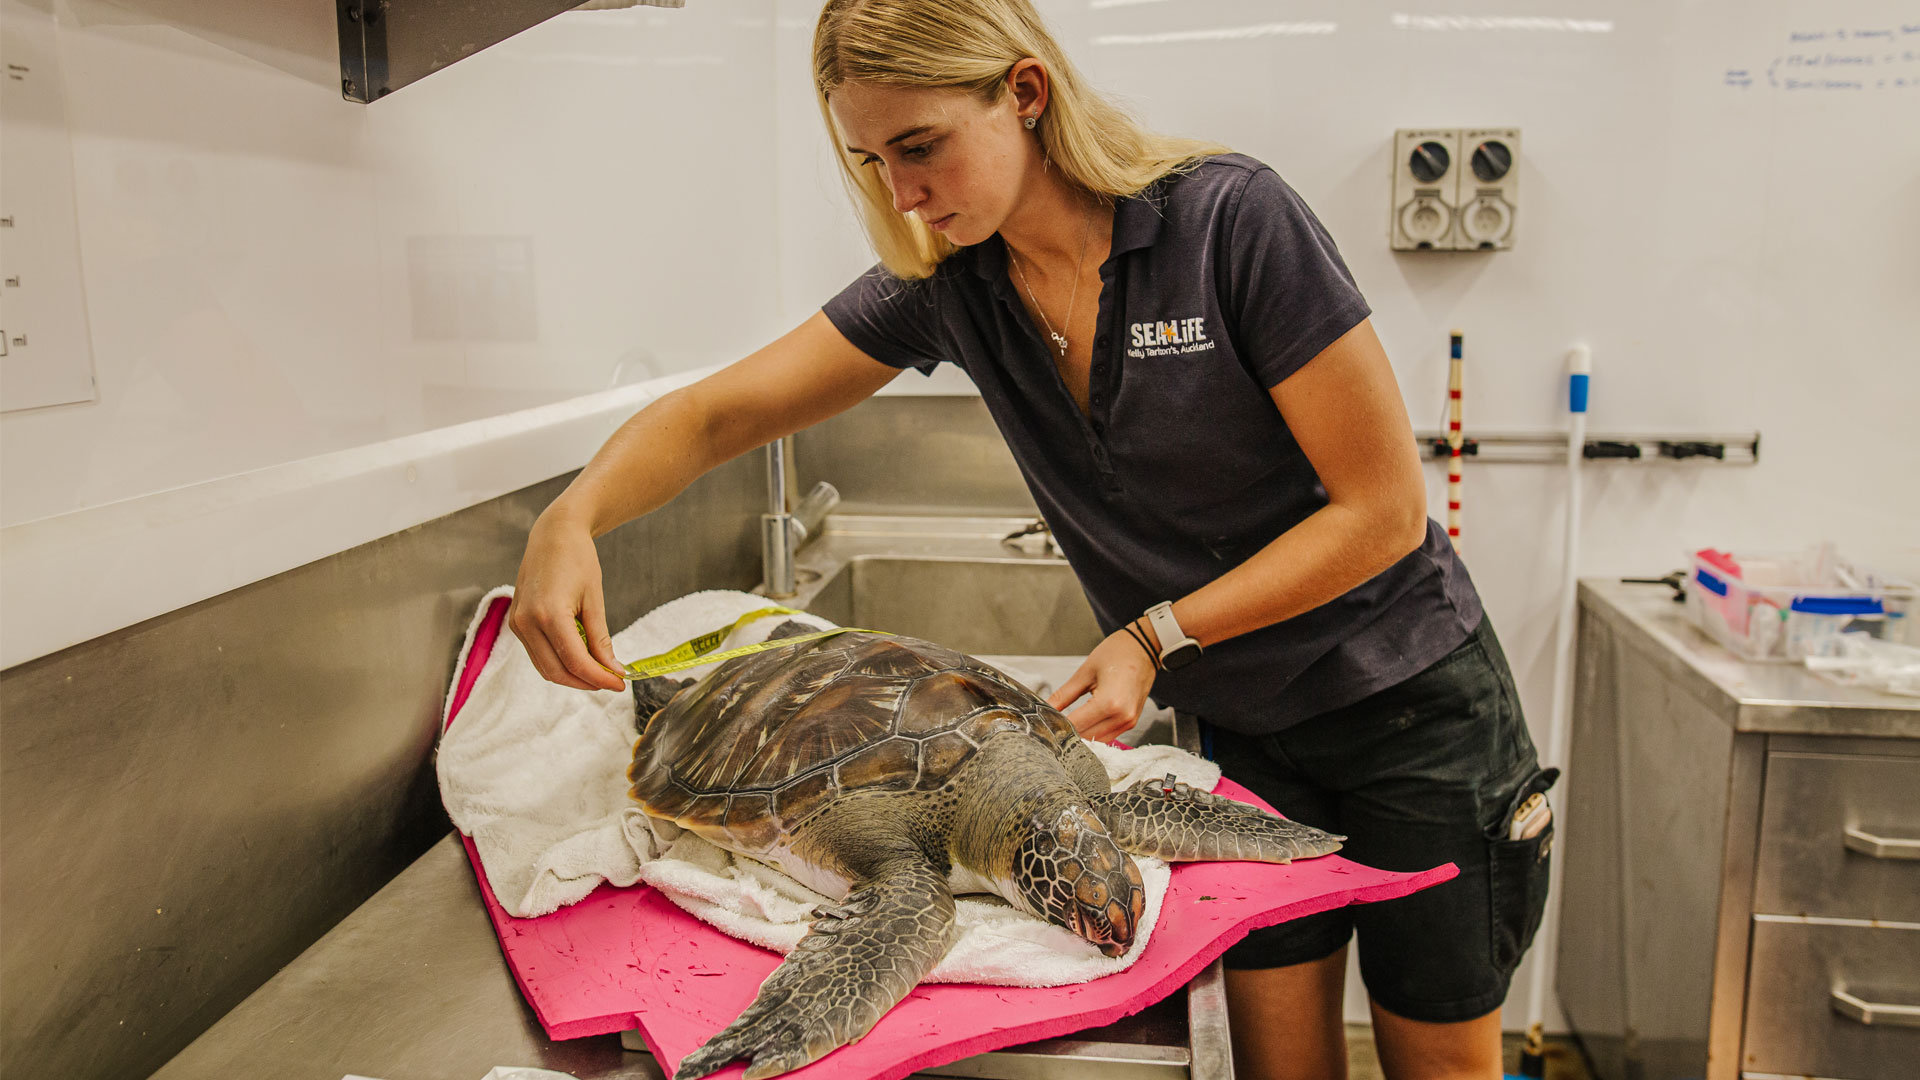 https://rfacdn.nz/zoo/assets/media/sea-turtle-kelly-tarltons-gallery-8.jpg